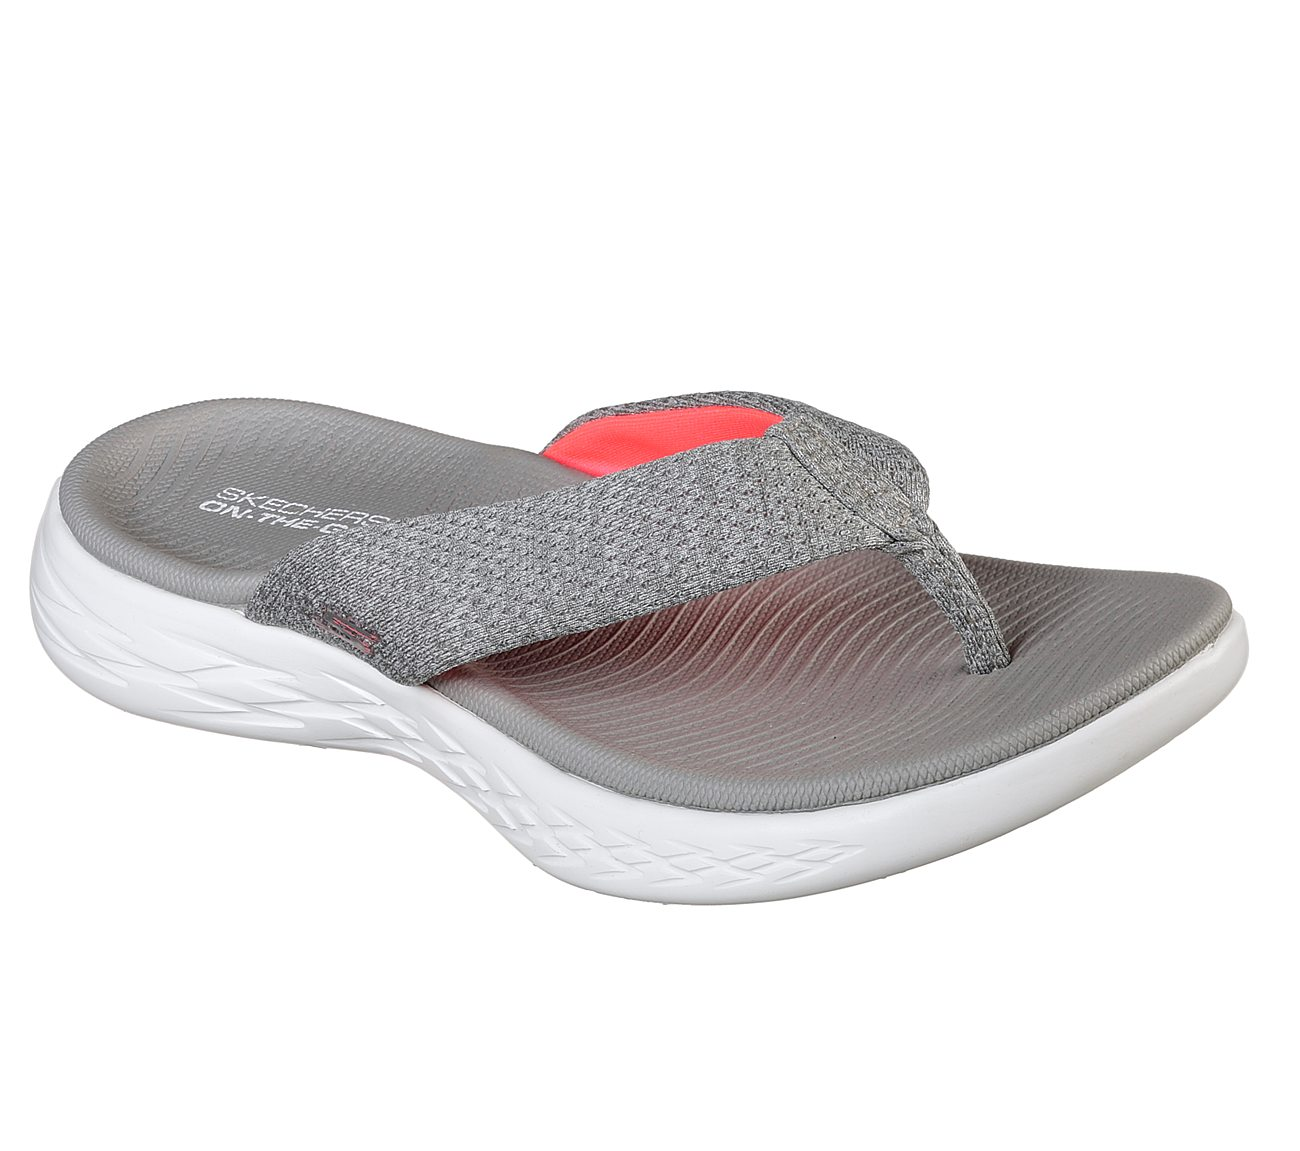 Skechers On the GO 600 - Preferred